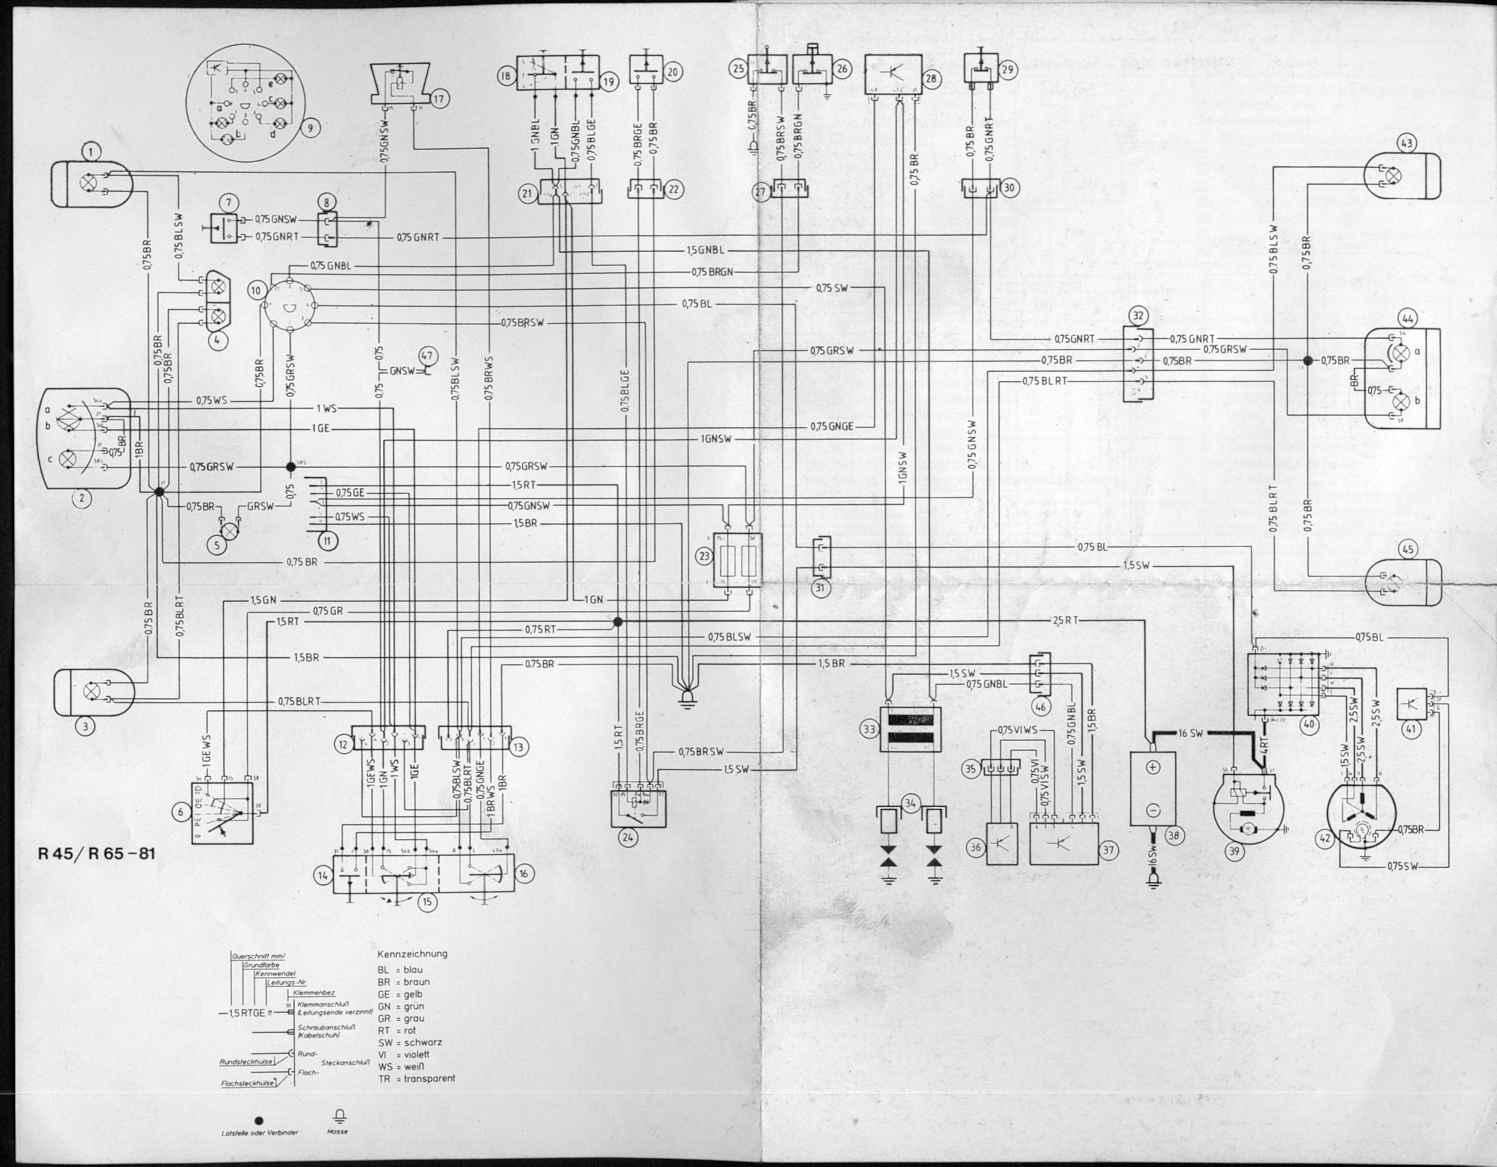 hight resolution of ab 1981 schaltplan d